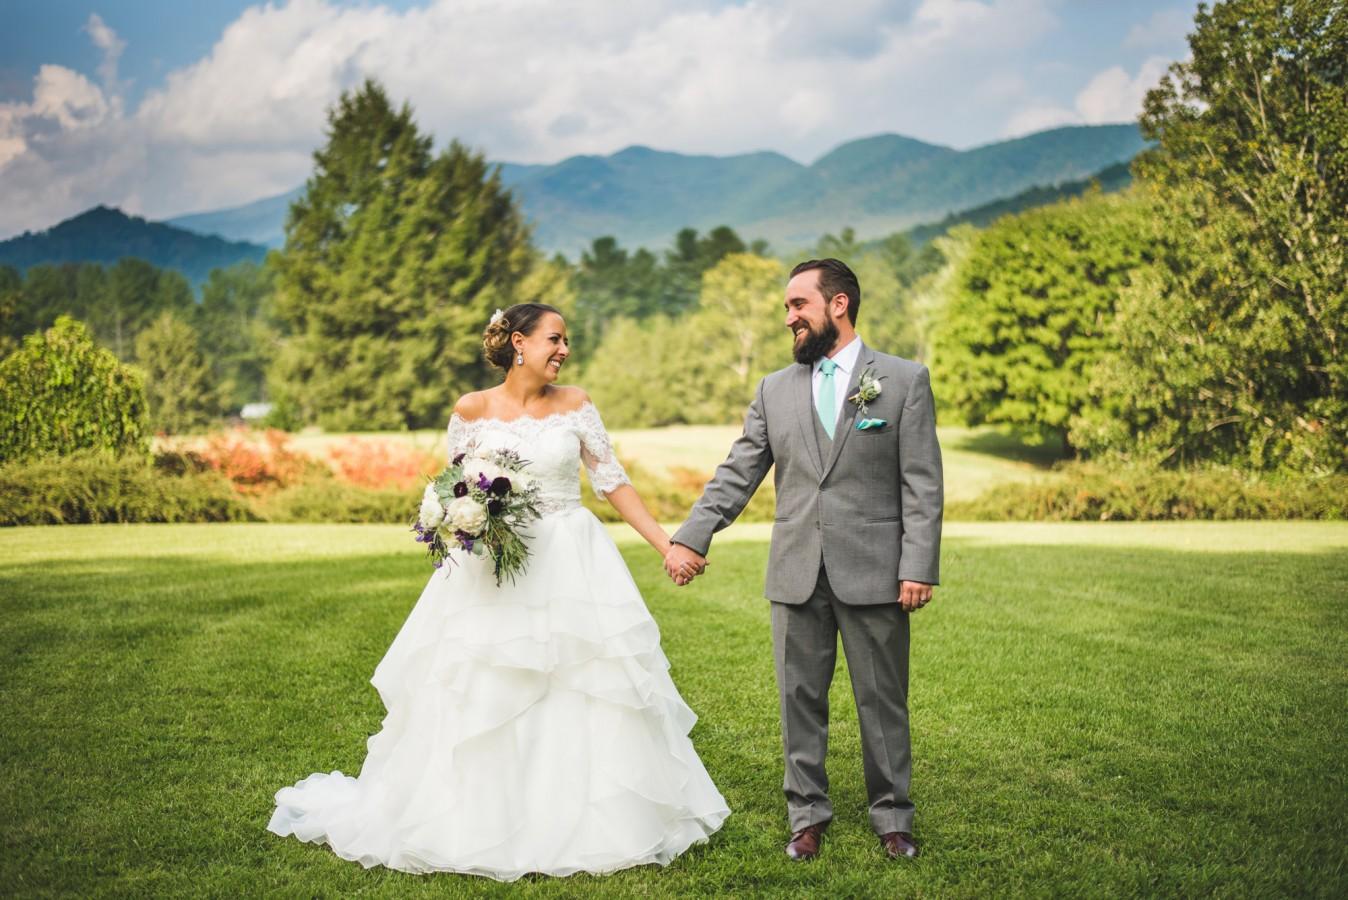 lake-eden-weddings-010